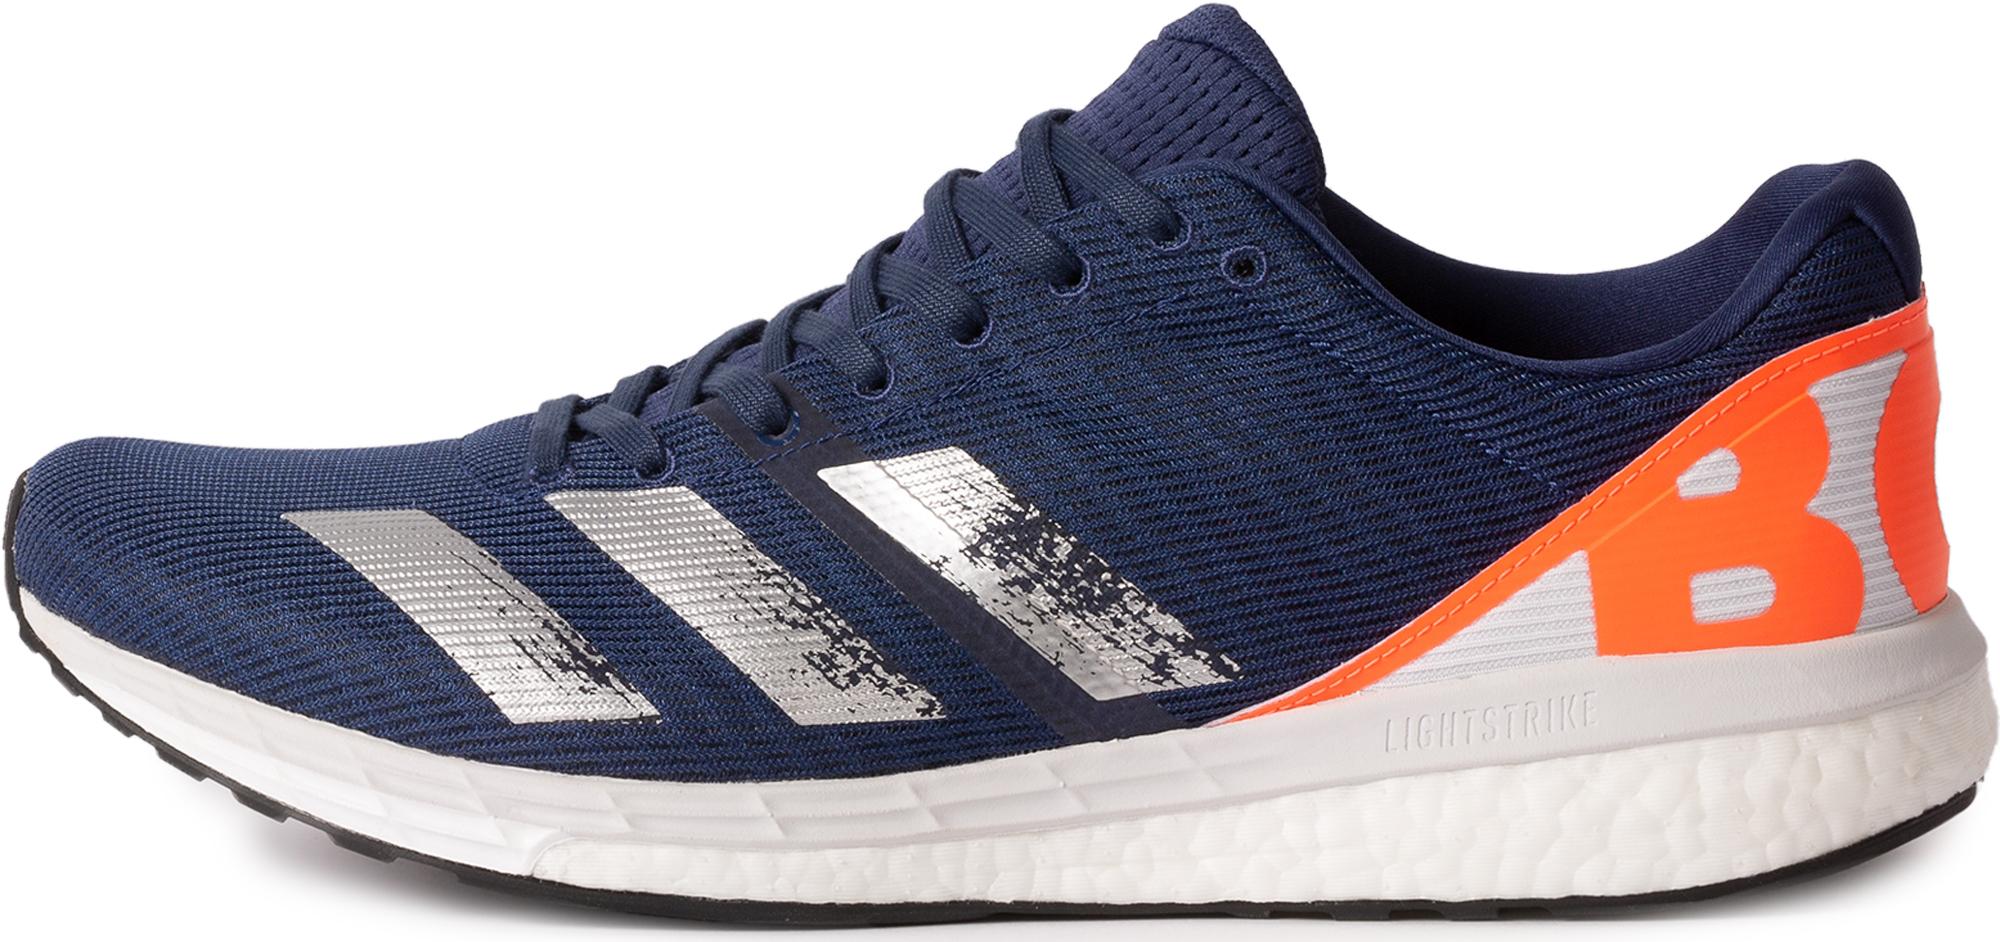 цена на Adidas Кроссовки мужские Adidas Adizero Boston 8, размер 39